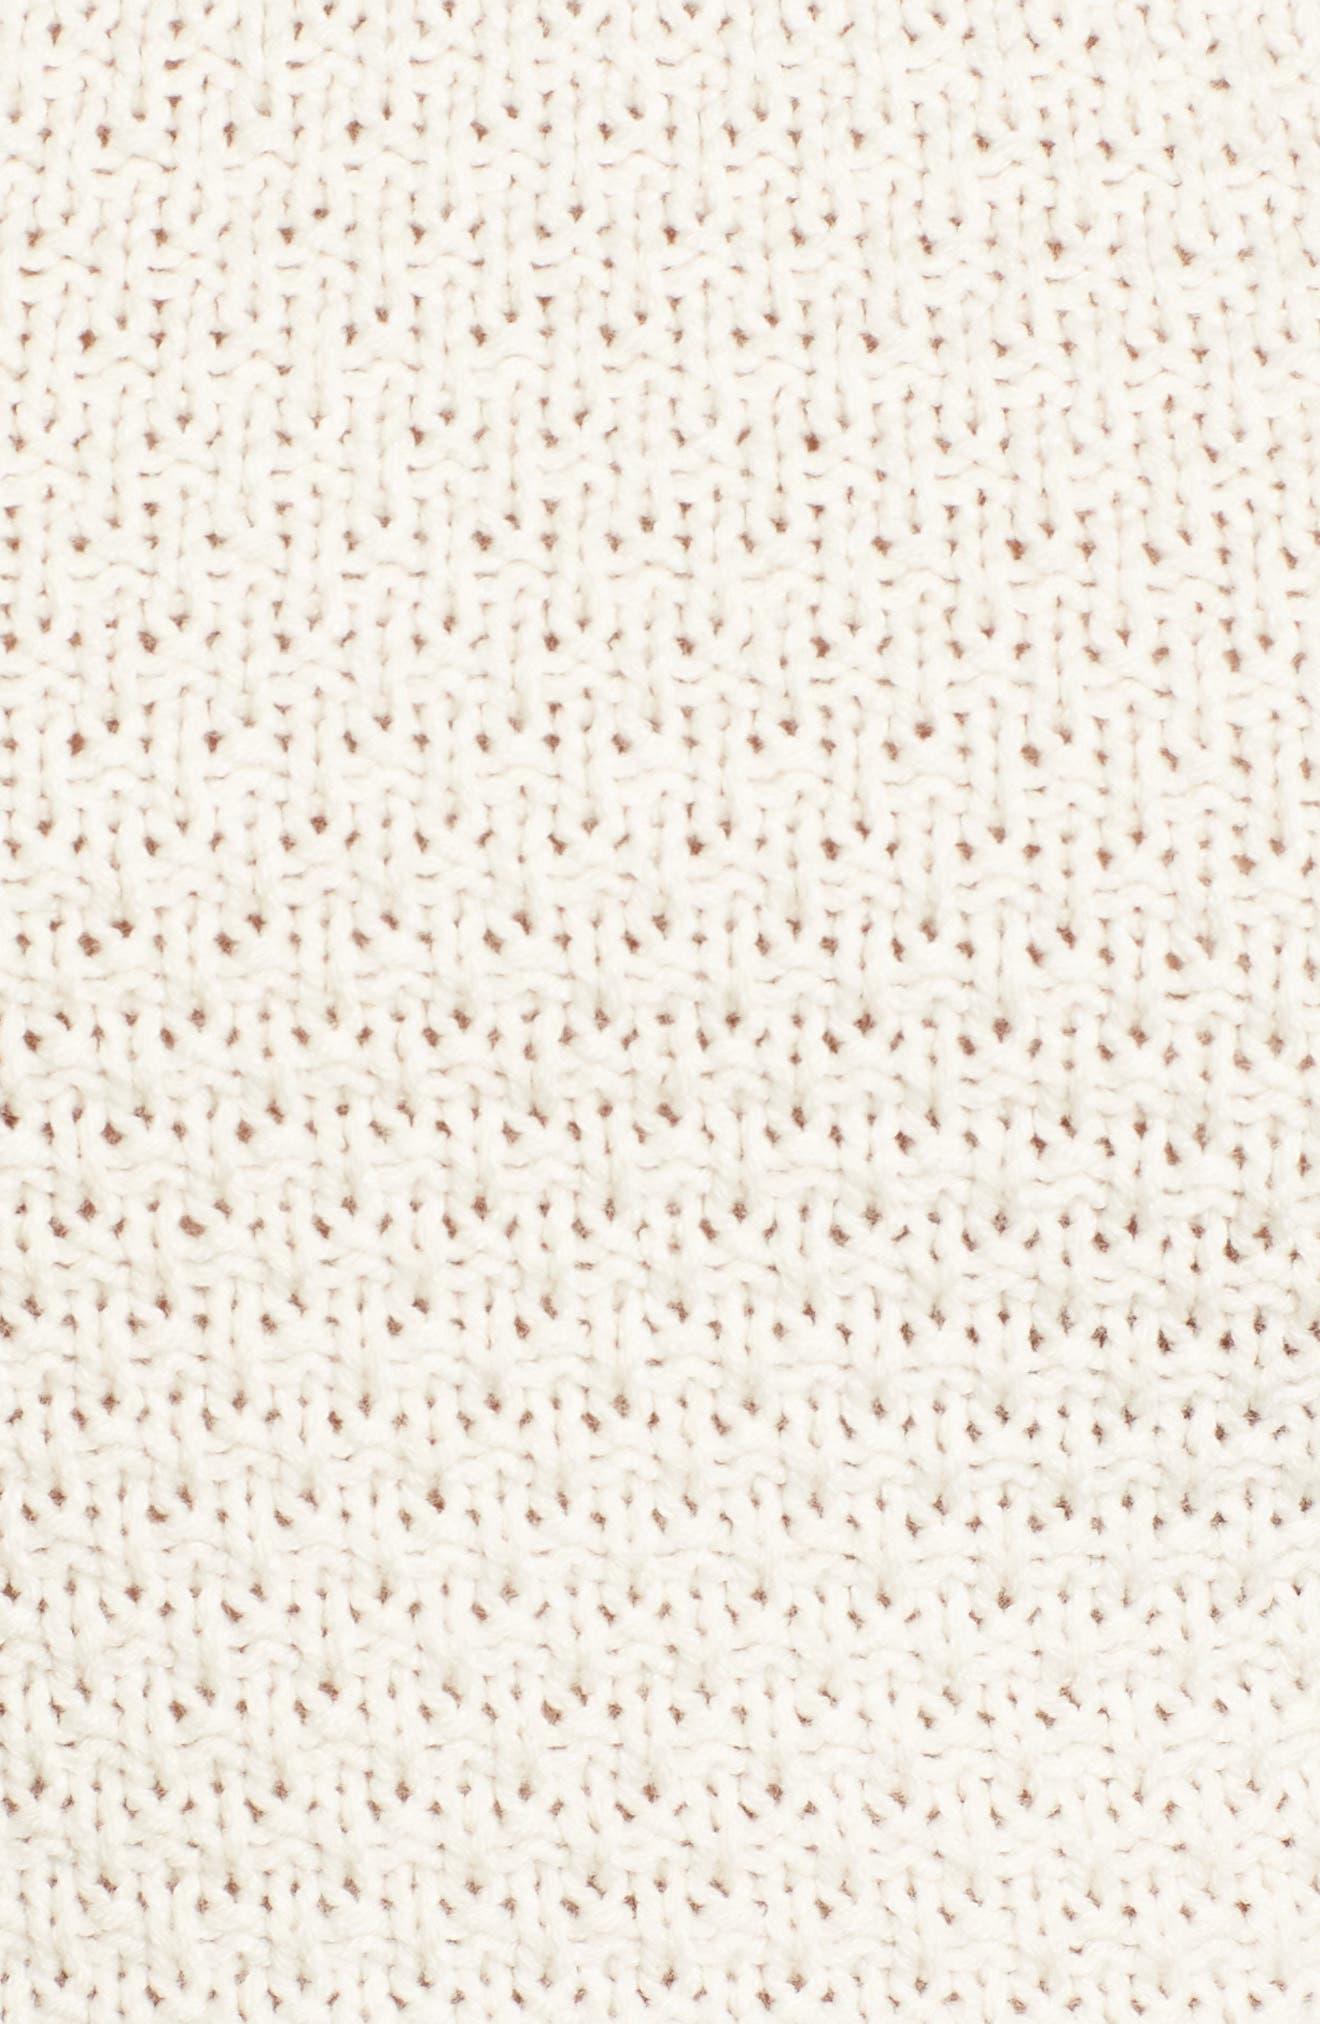 Fringe Sweater Halter Top,                             Alternate thumbnail 6, color,                             Stone Oatmeal Marl